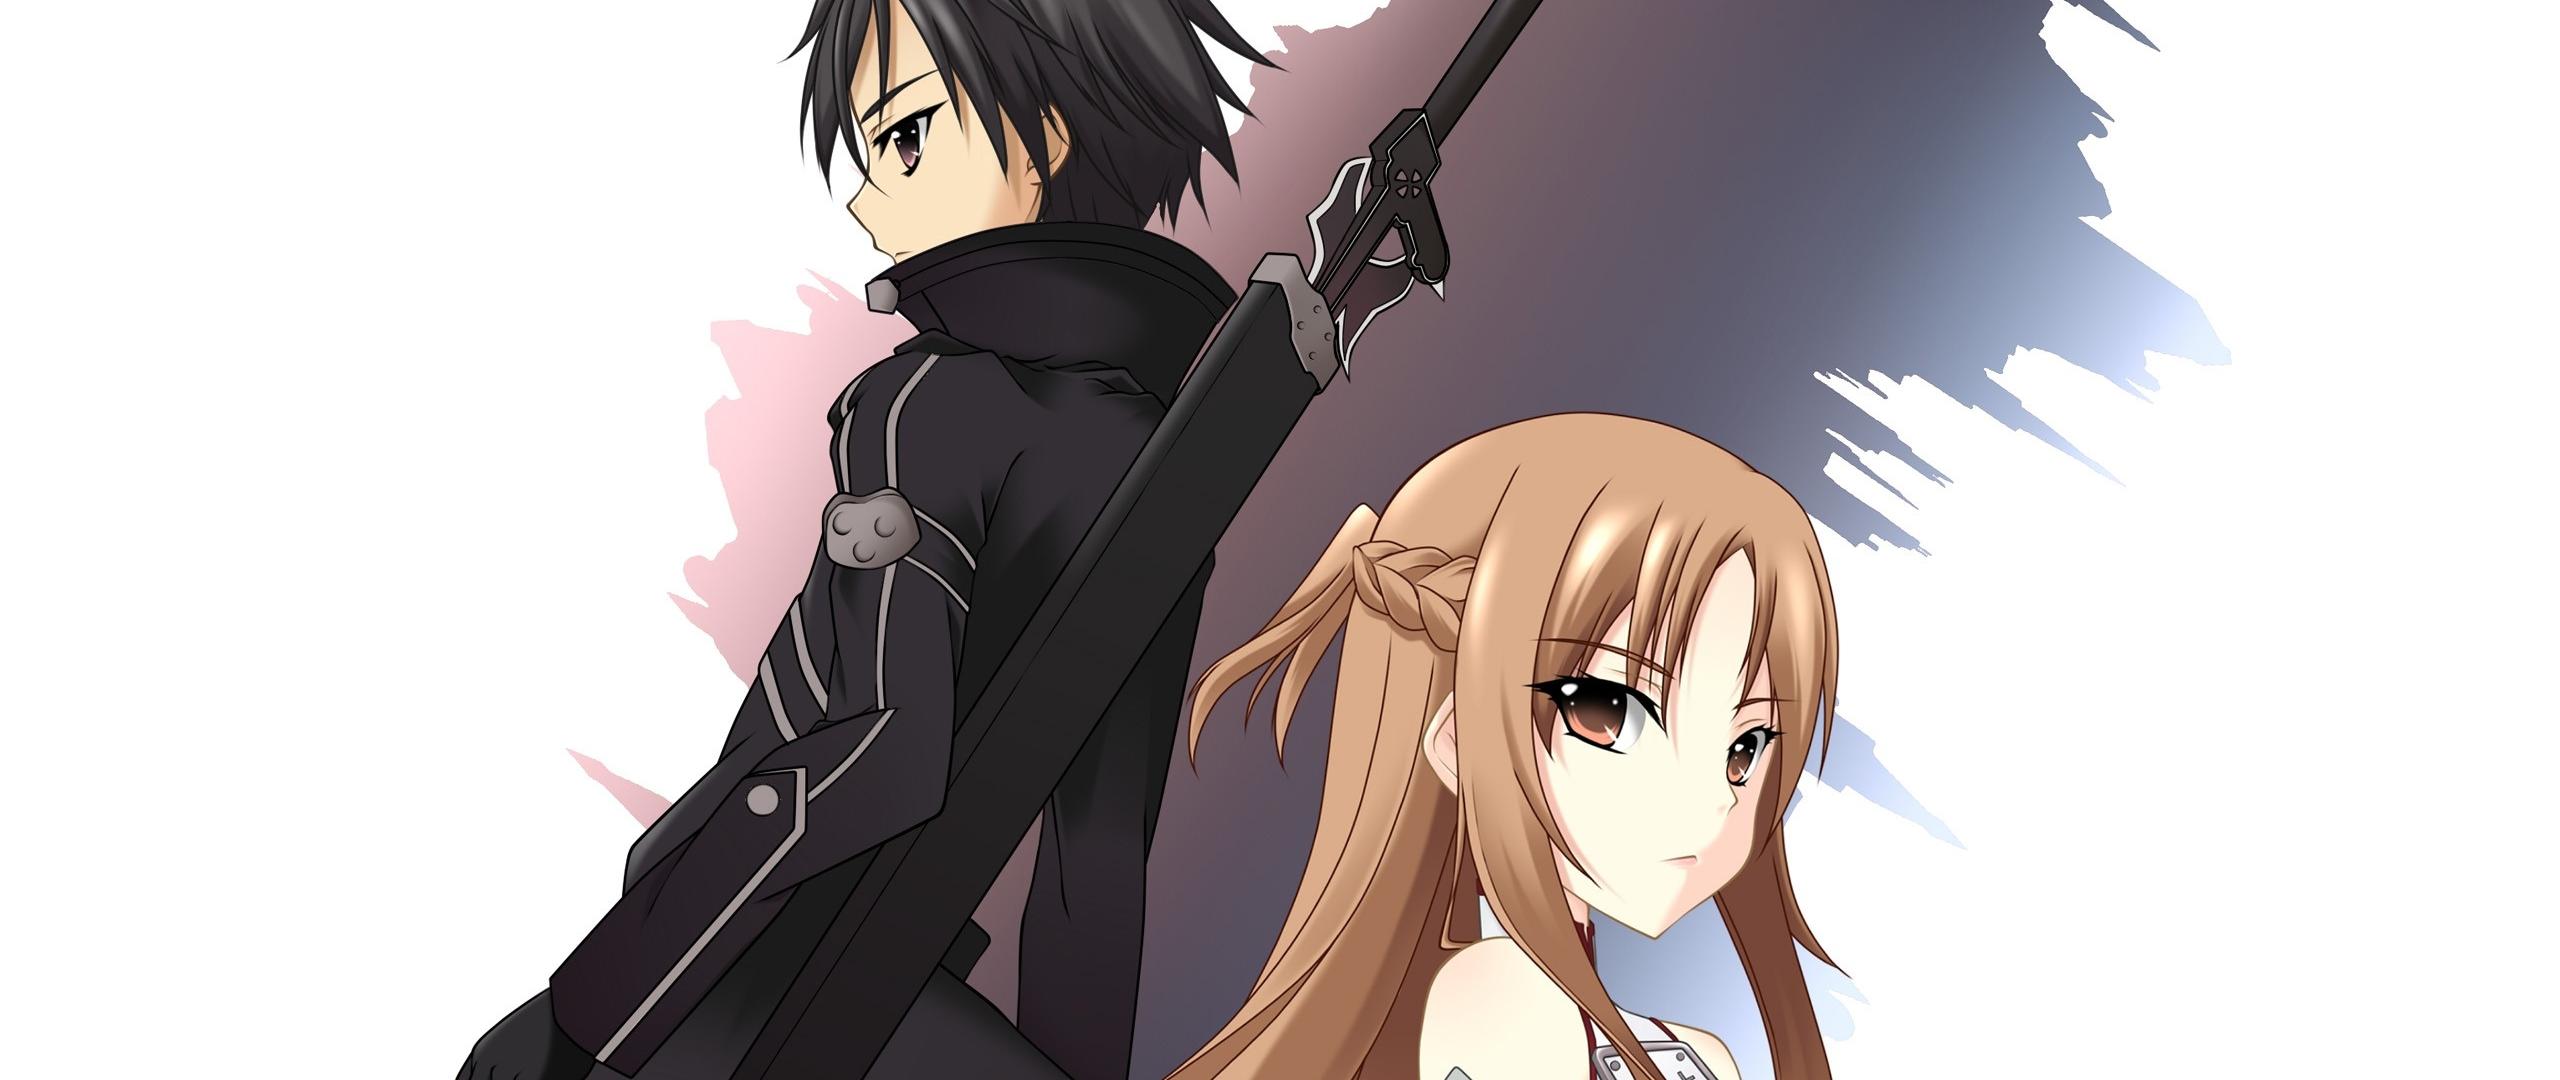 2560x1080 Sword Art Online Asuna Yuuki Kazuto Kirigaya 2560x1080